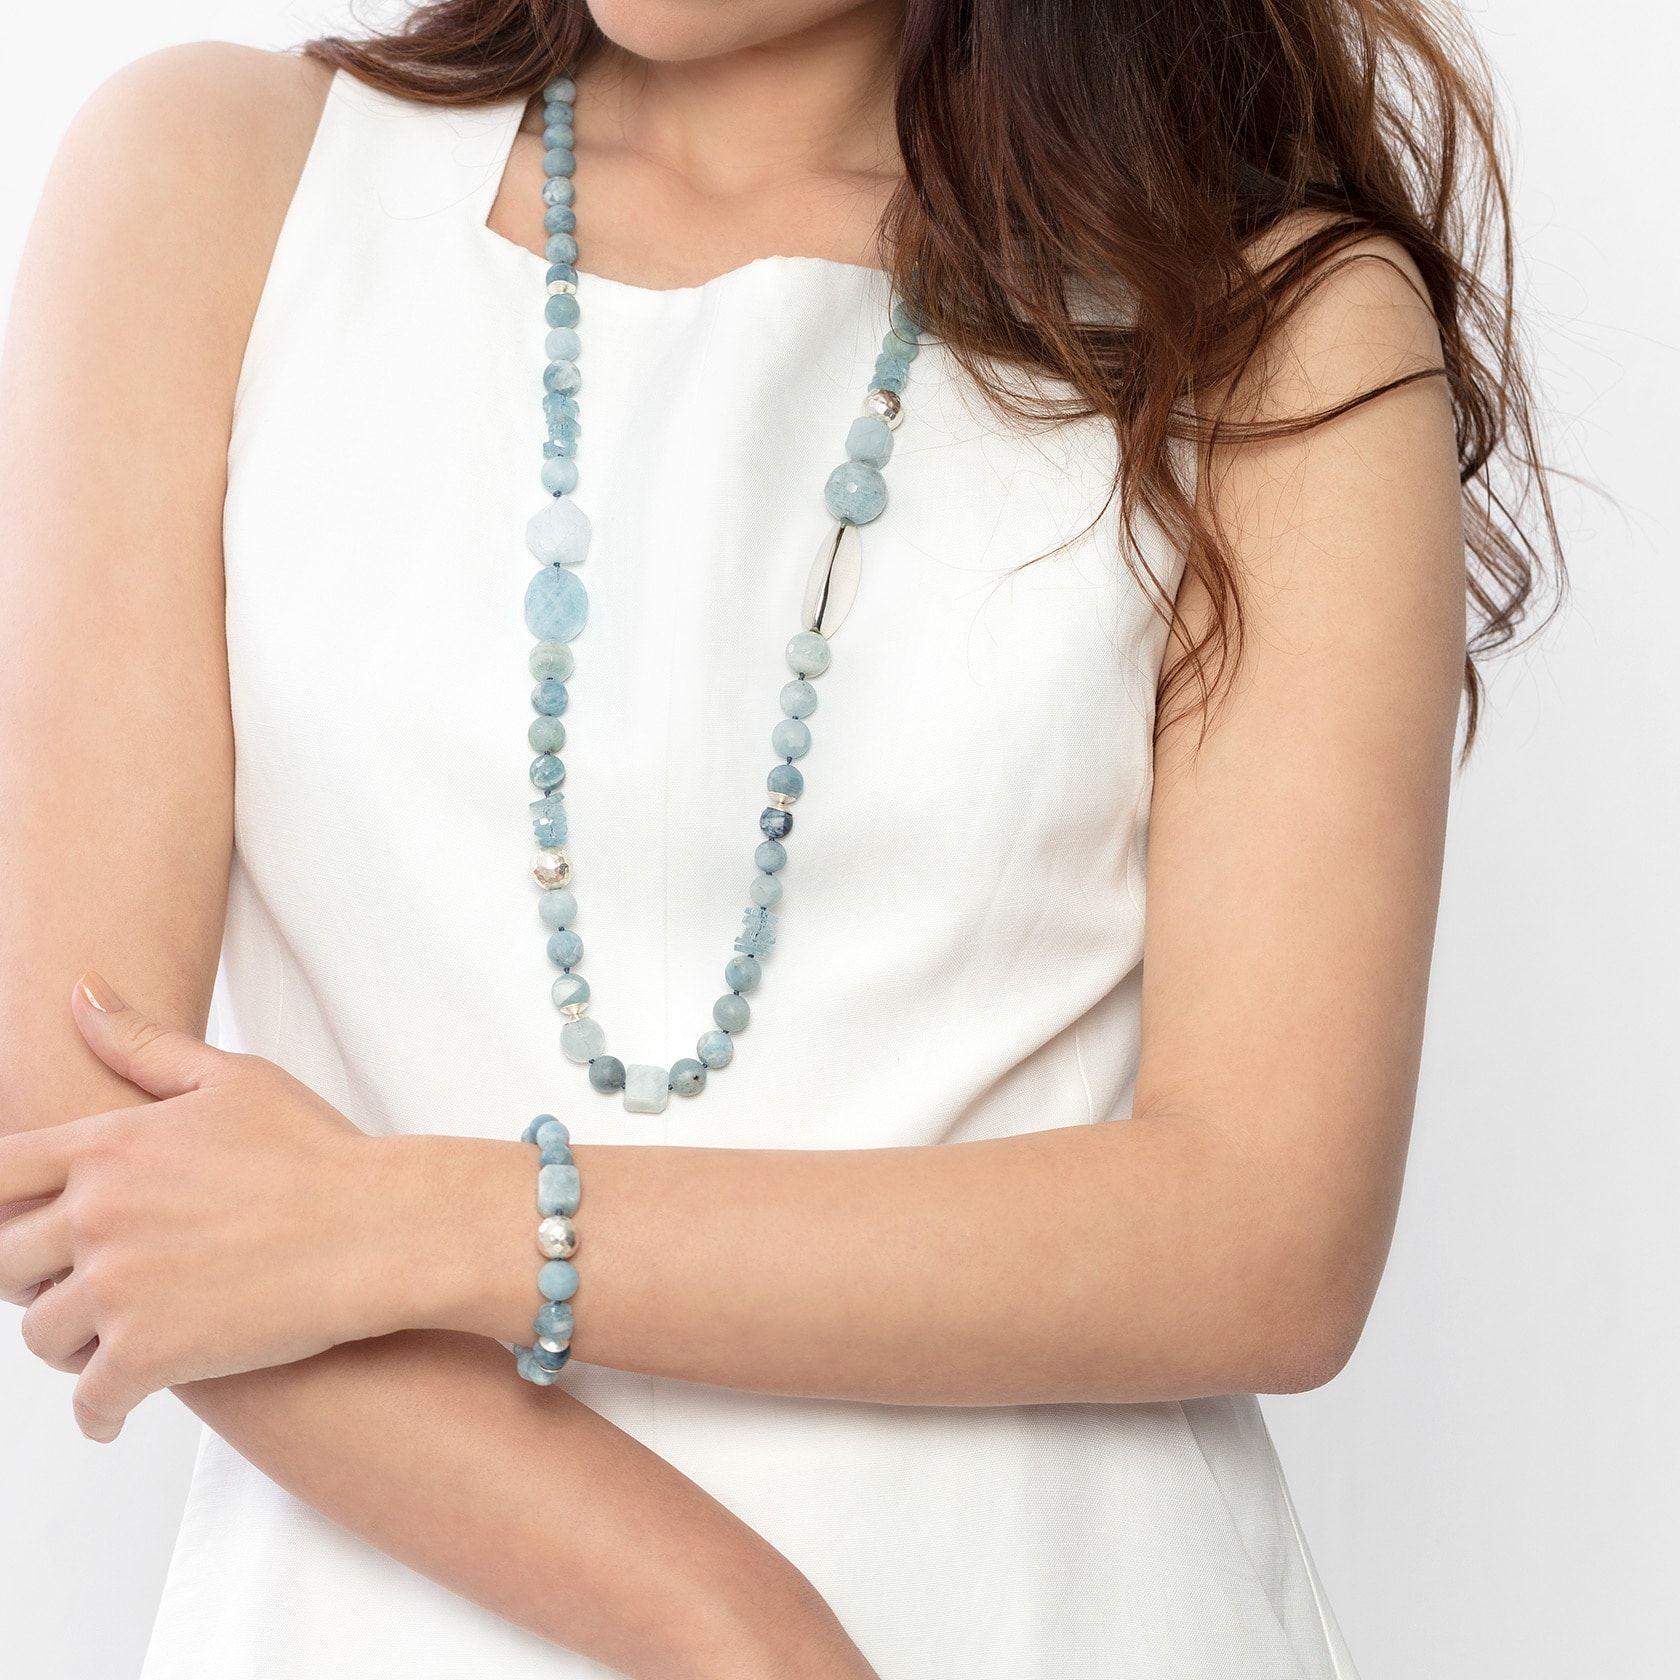 Irreuglar aquamarine bracelet